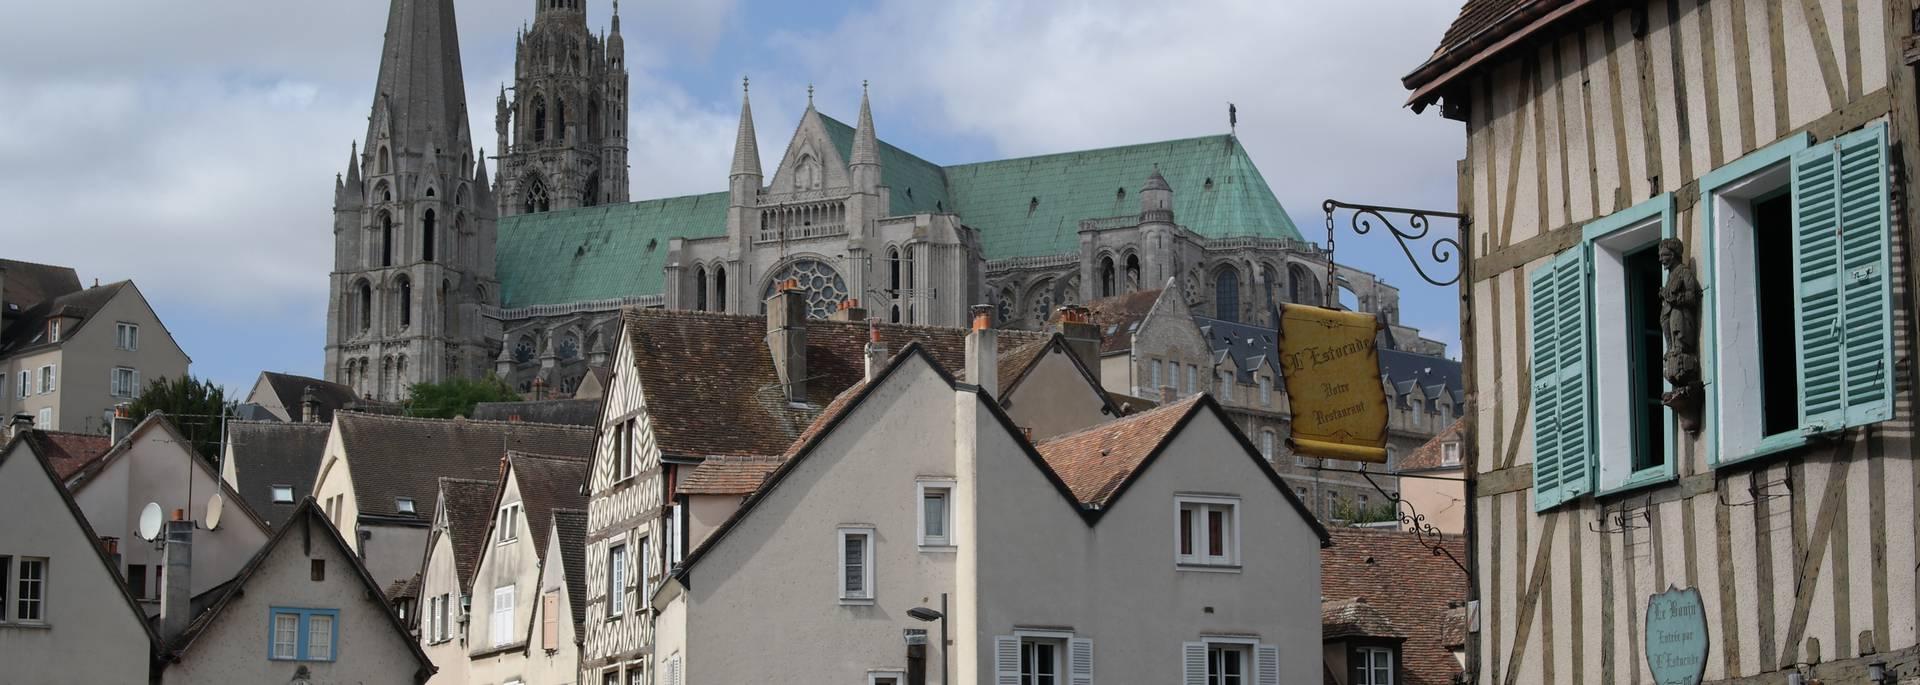 Basse ville Pont Bouju Cathédrale